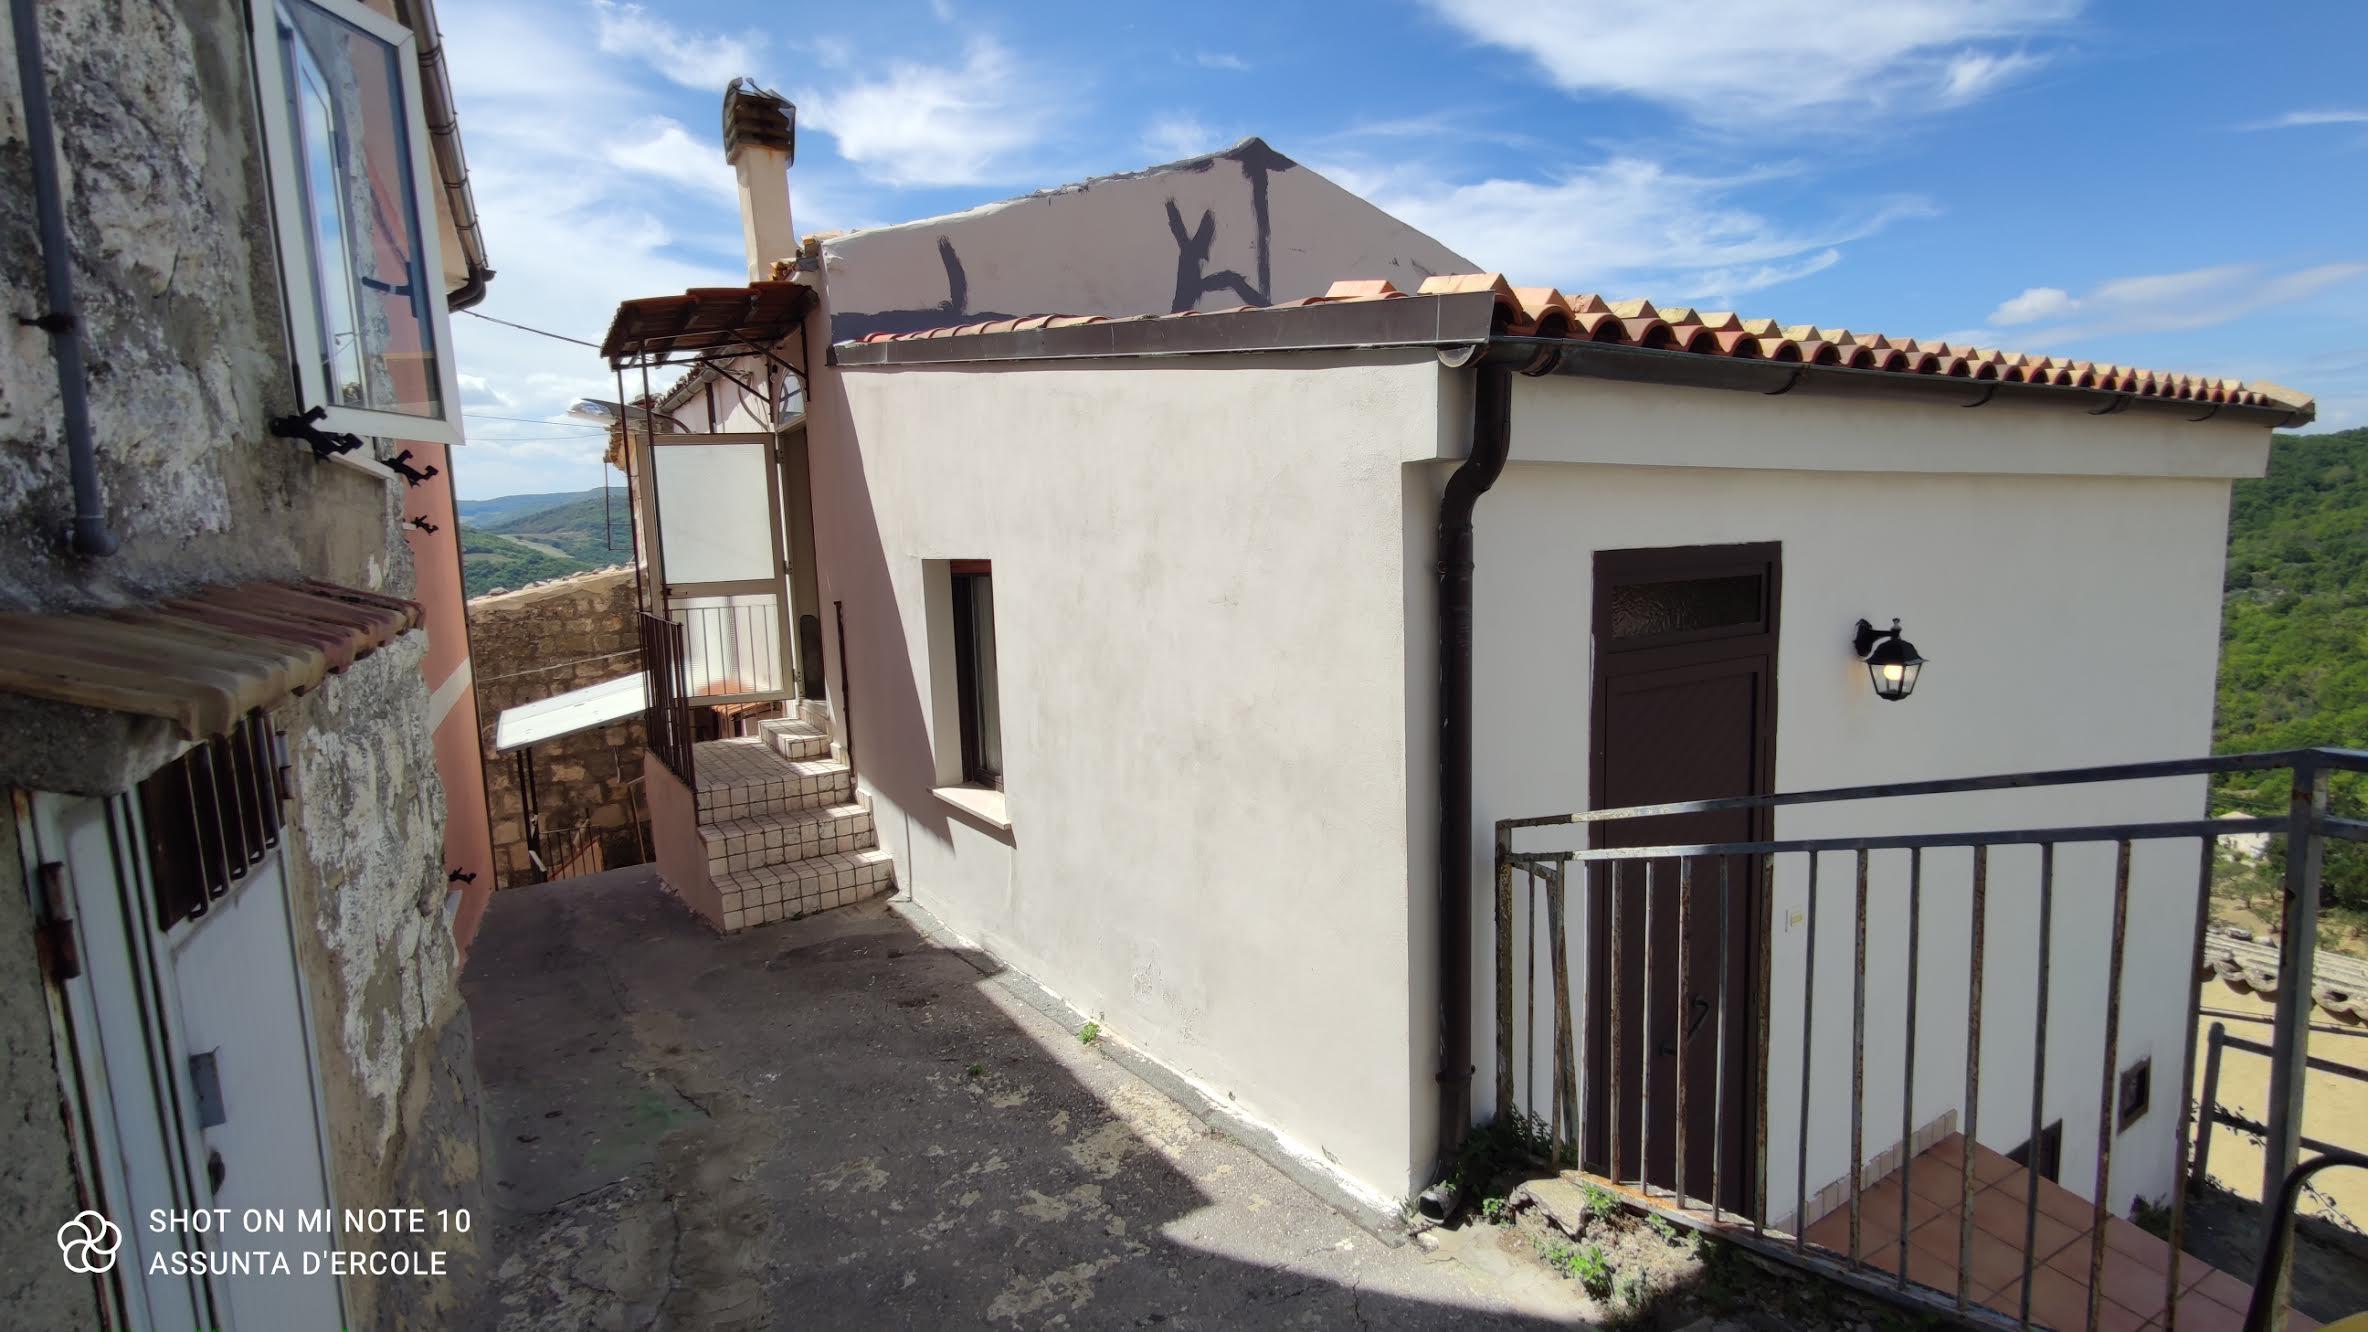 Rif 1296 Fresagrandinaria (CH) – Casa abitabile con vista panoramica – € 79000